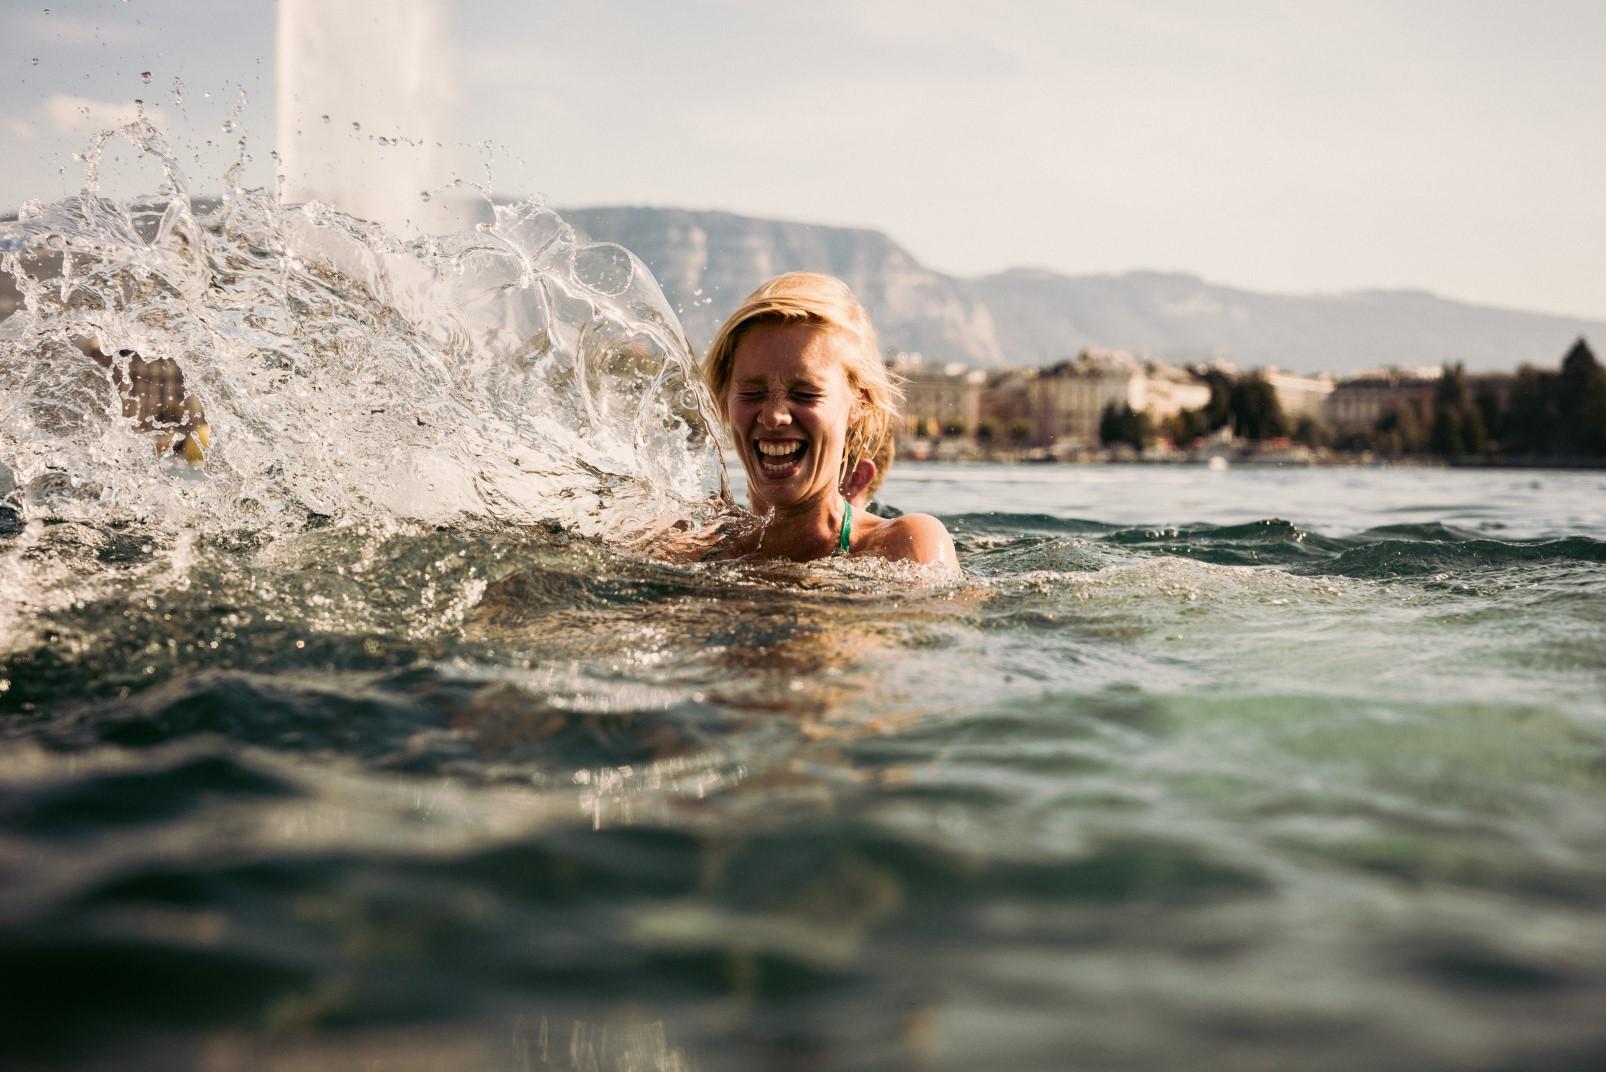 Swimming at Bains des Paquis - Geneva